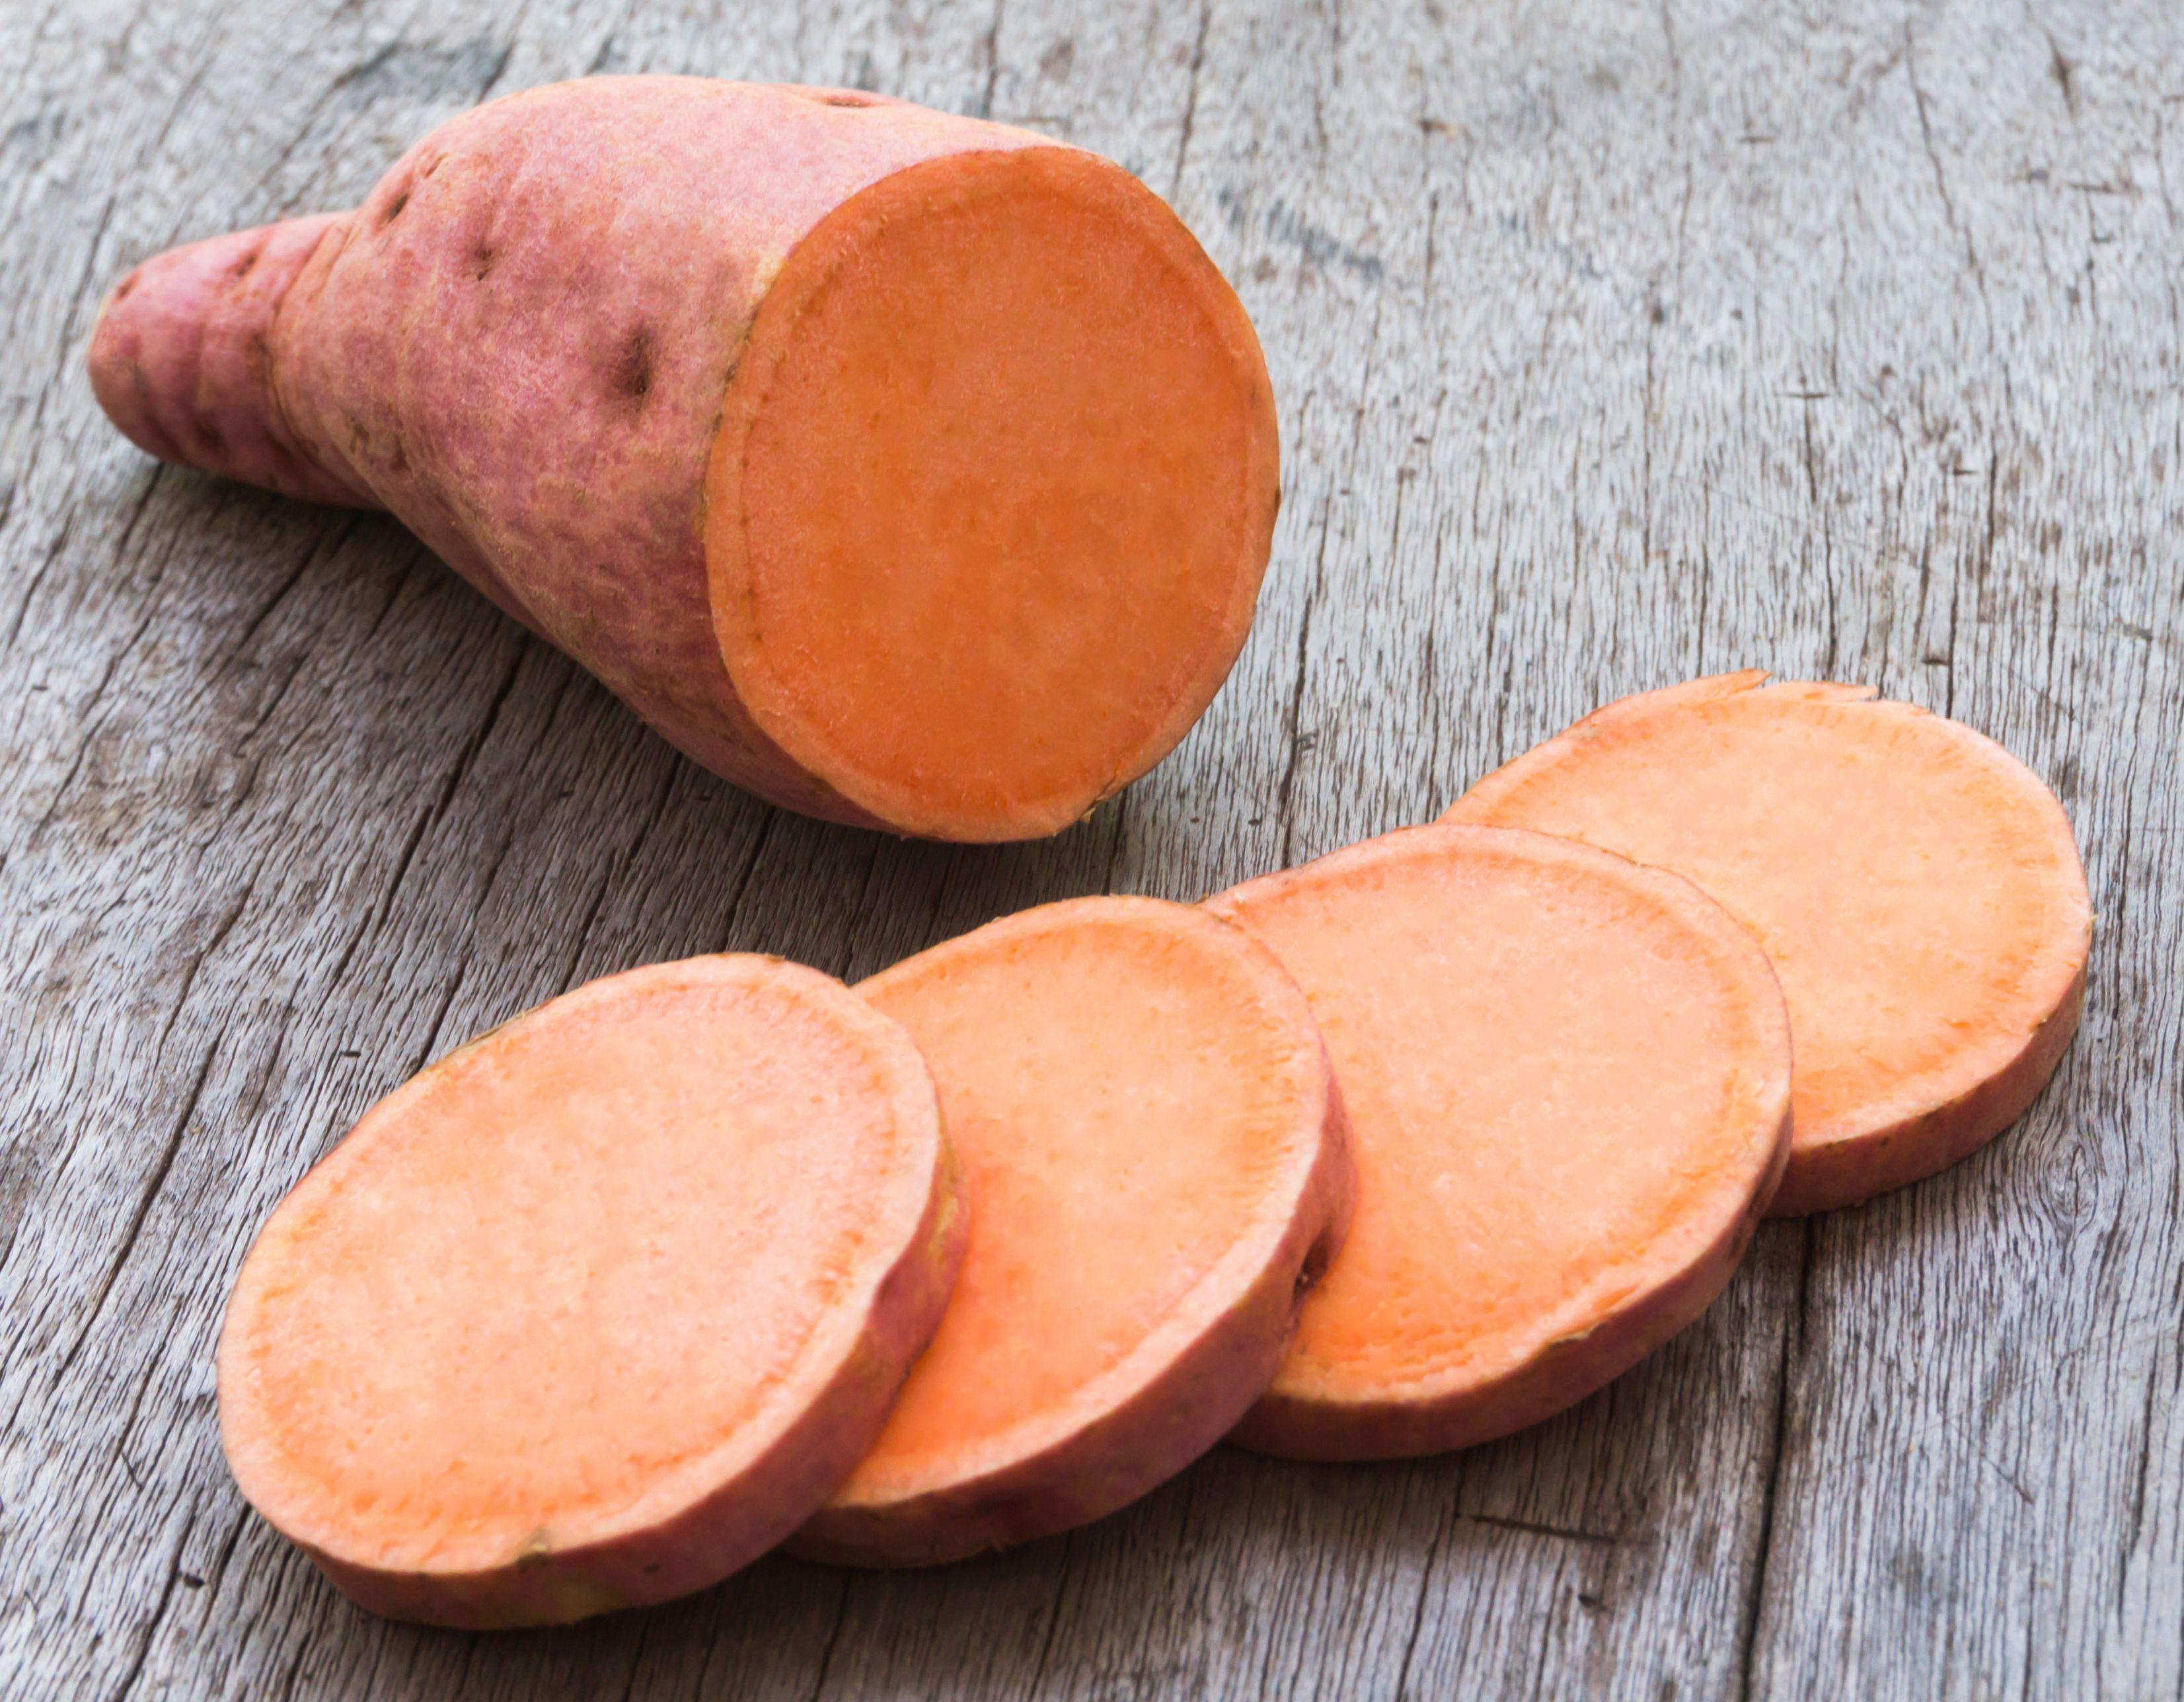 5 Unexpected Health Benefits of Sweet Potatoes